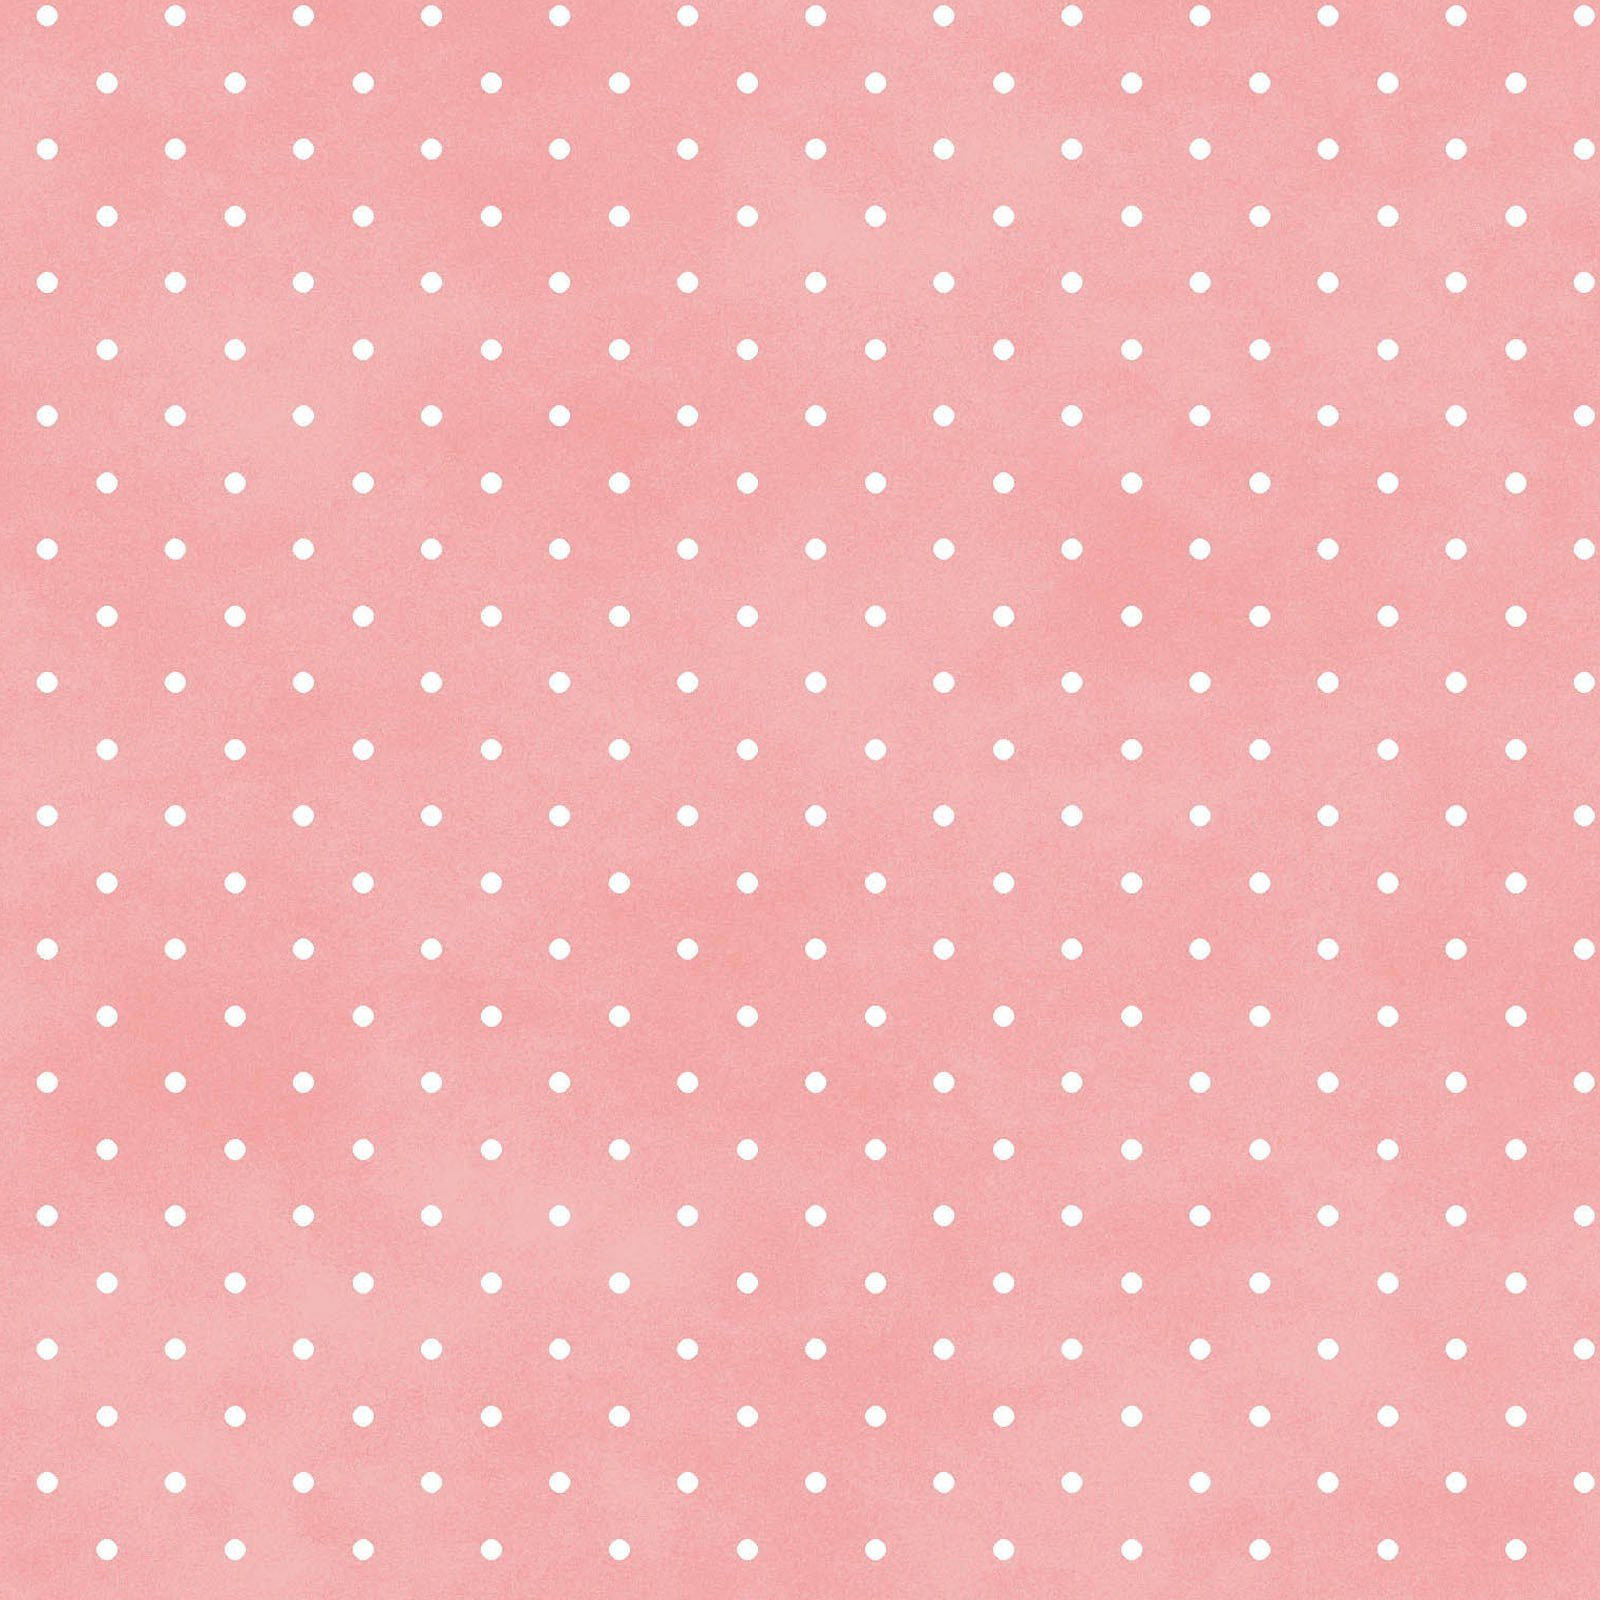 Pin Dots - Soft Pink FQ 609-P3<br/>Maywood Studio